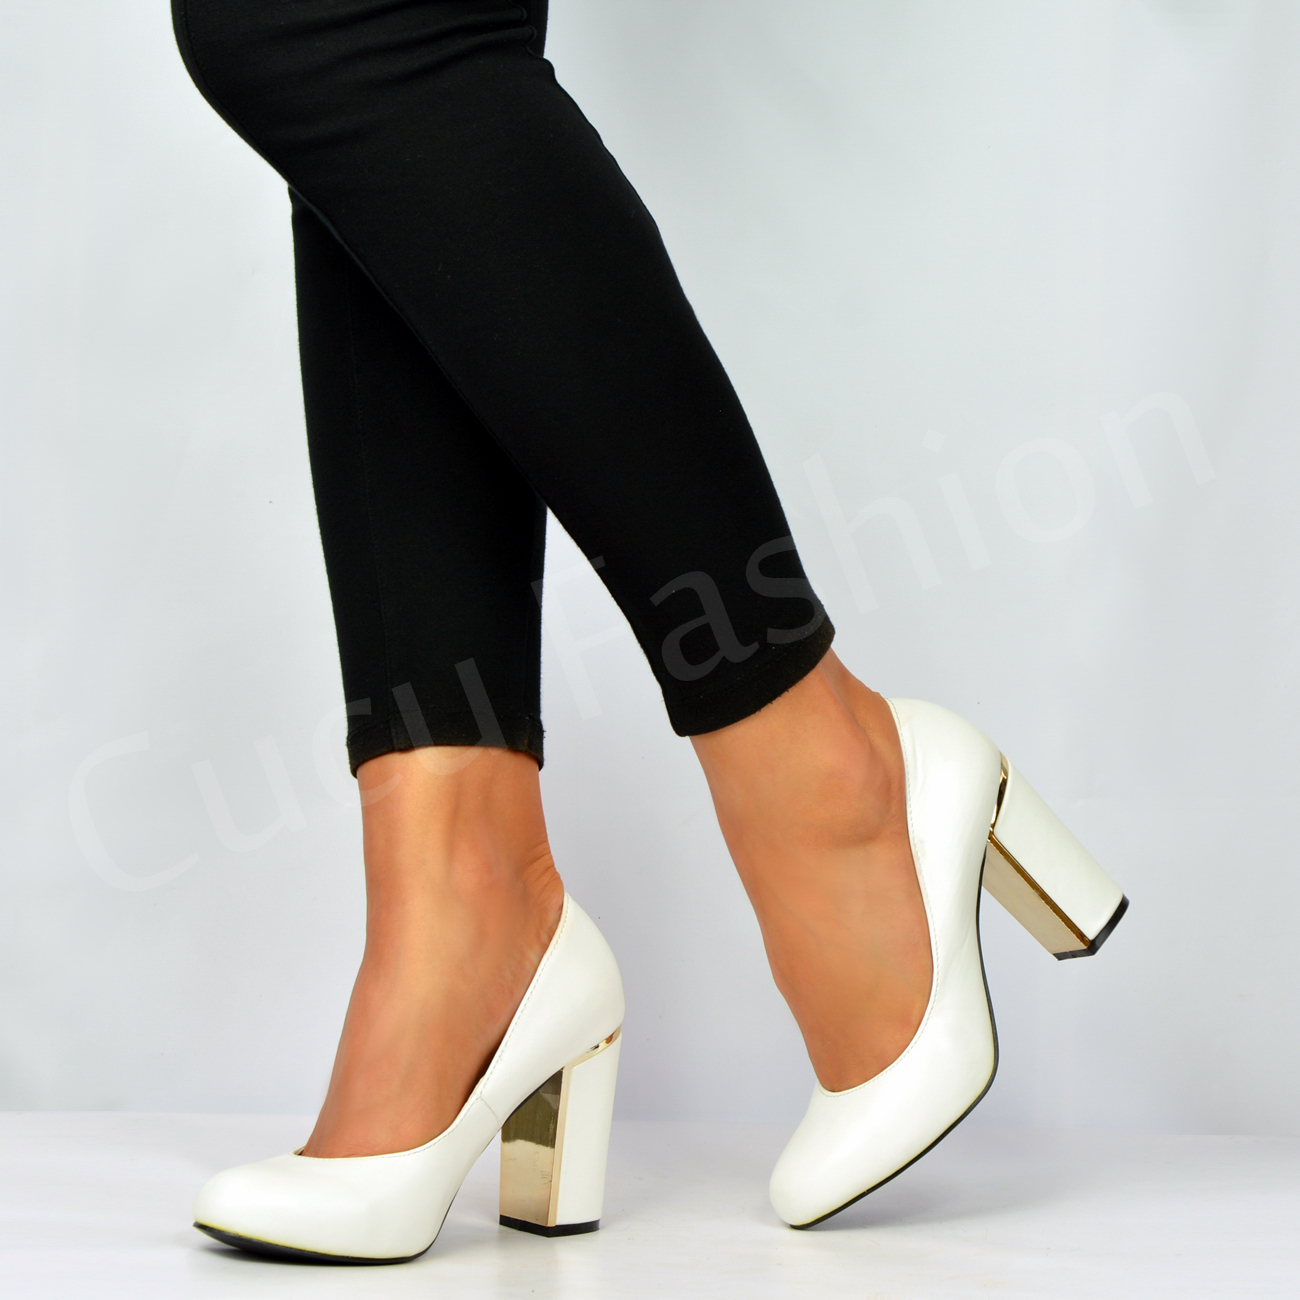 Womens sandals uk - Brand New Womens Sandals Ladies High Gold Block